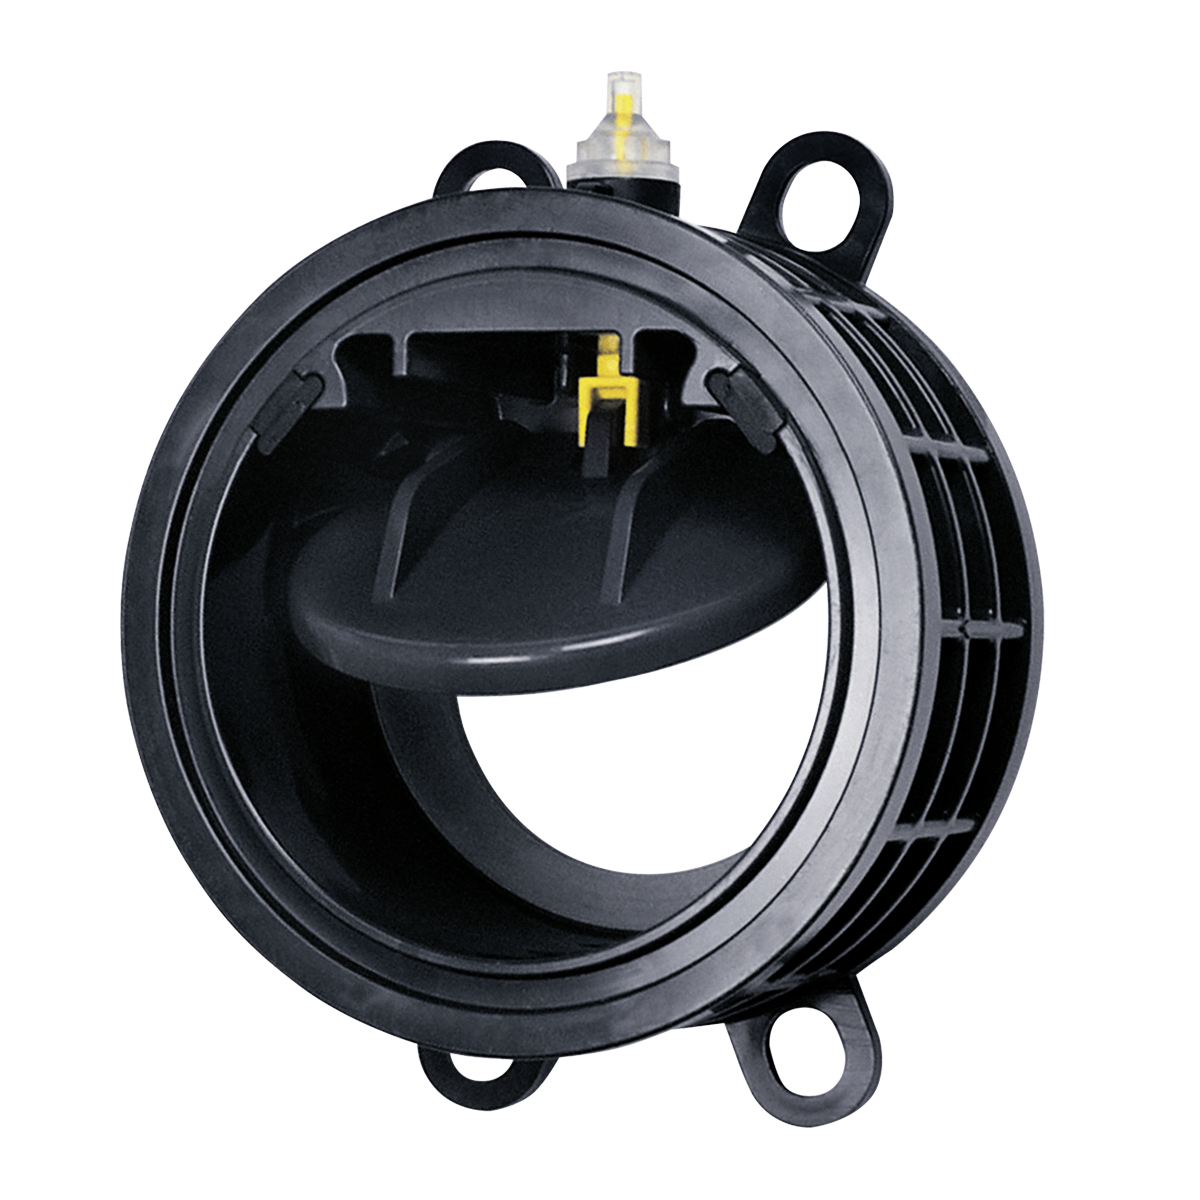 Praher Wafer type check valve K4 PVC, grey